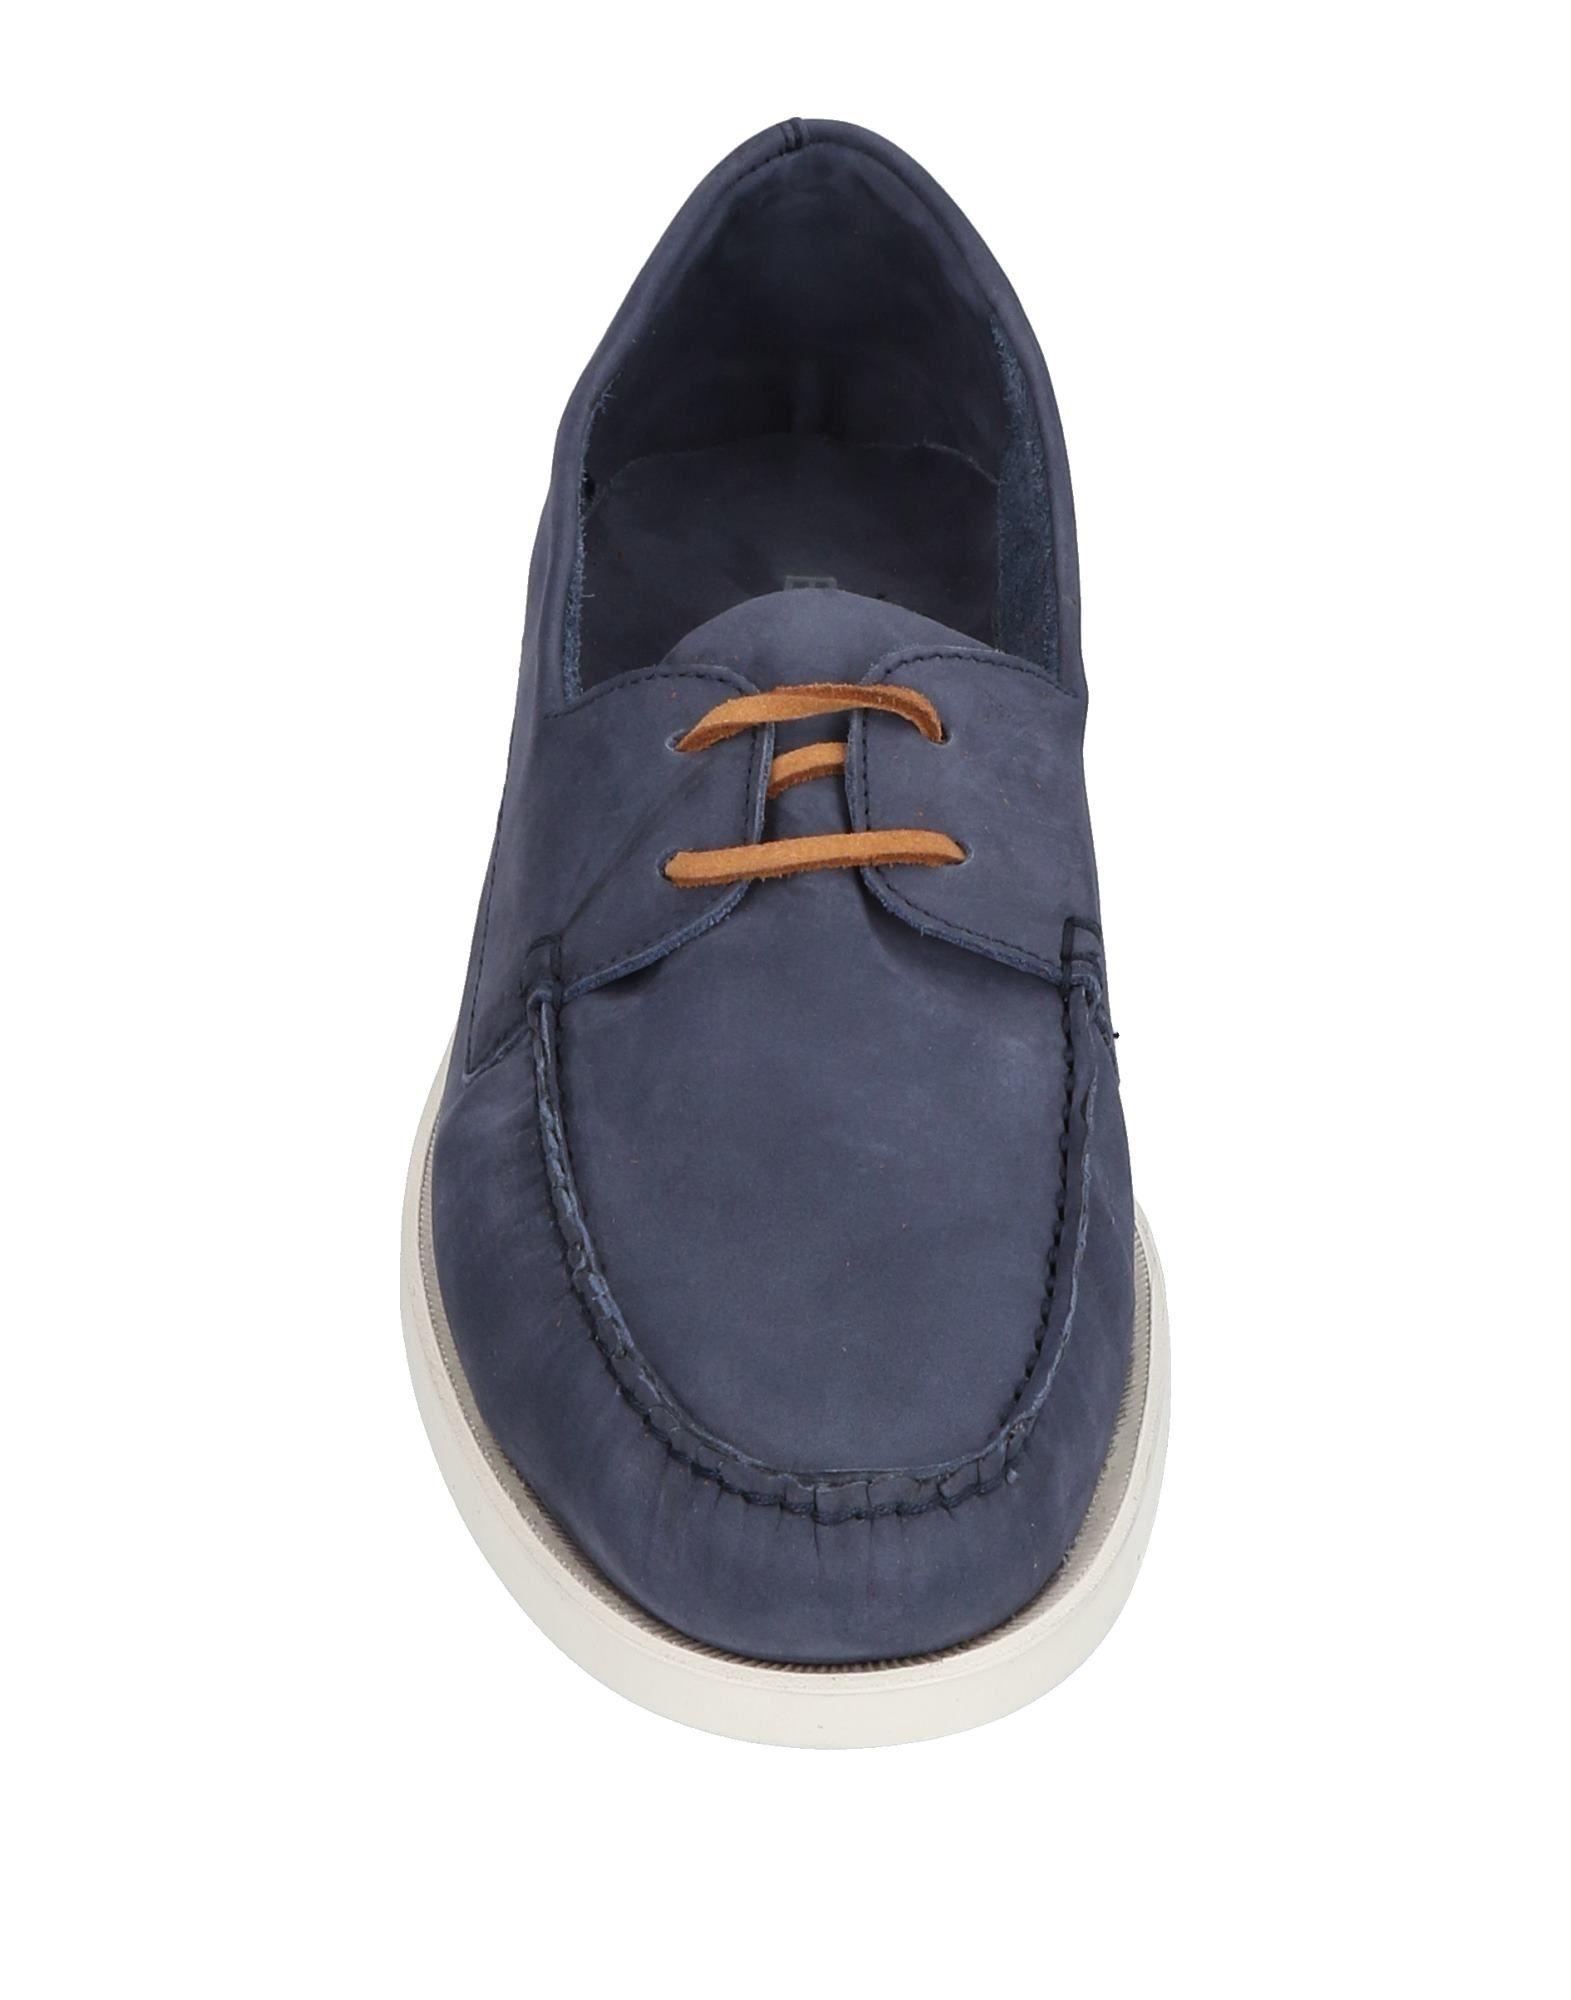 Boemos Herren Mokassins Herren Boemos  11438421XR Heiße Schuhe 2c3b5a